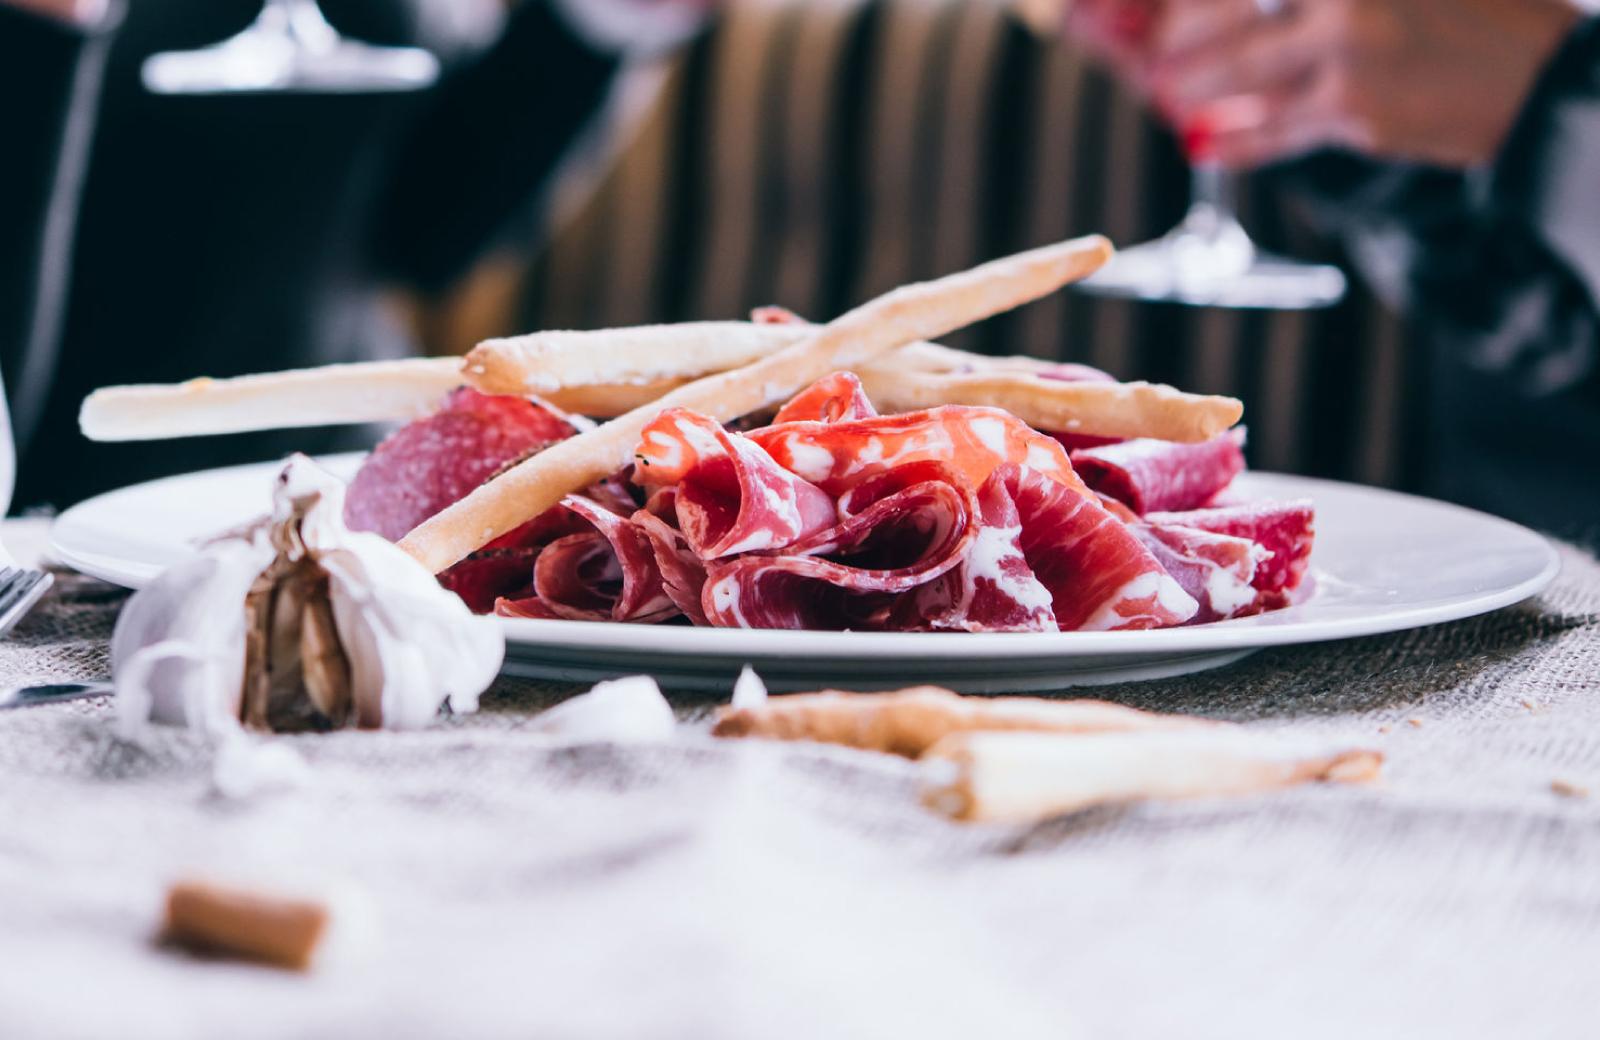 steak on a plate - 6 best restaurants in San Pedro - The Vue